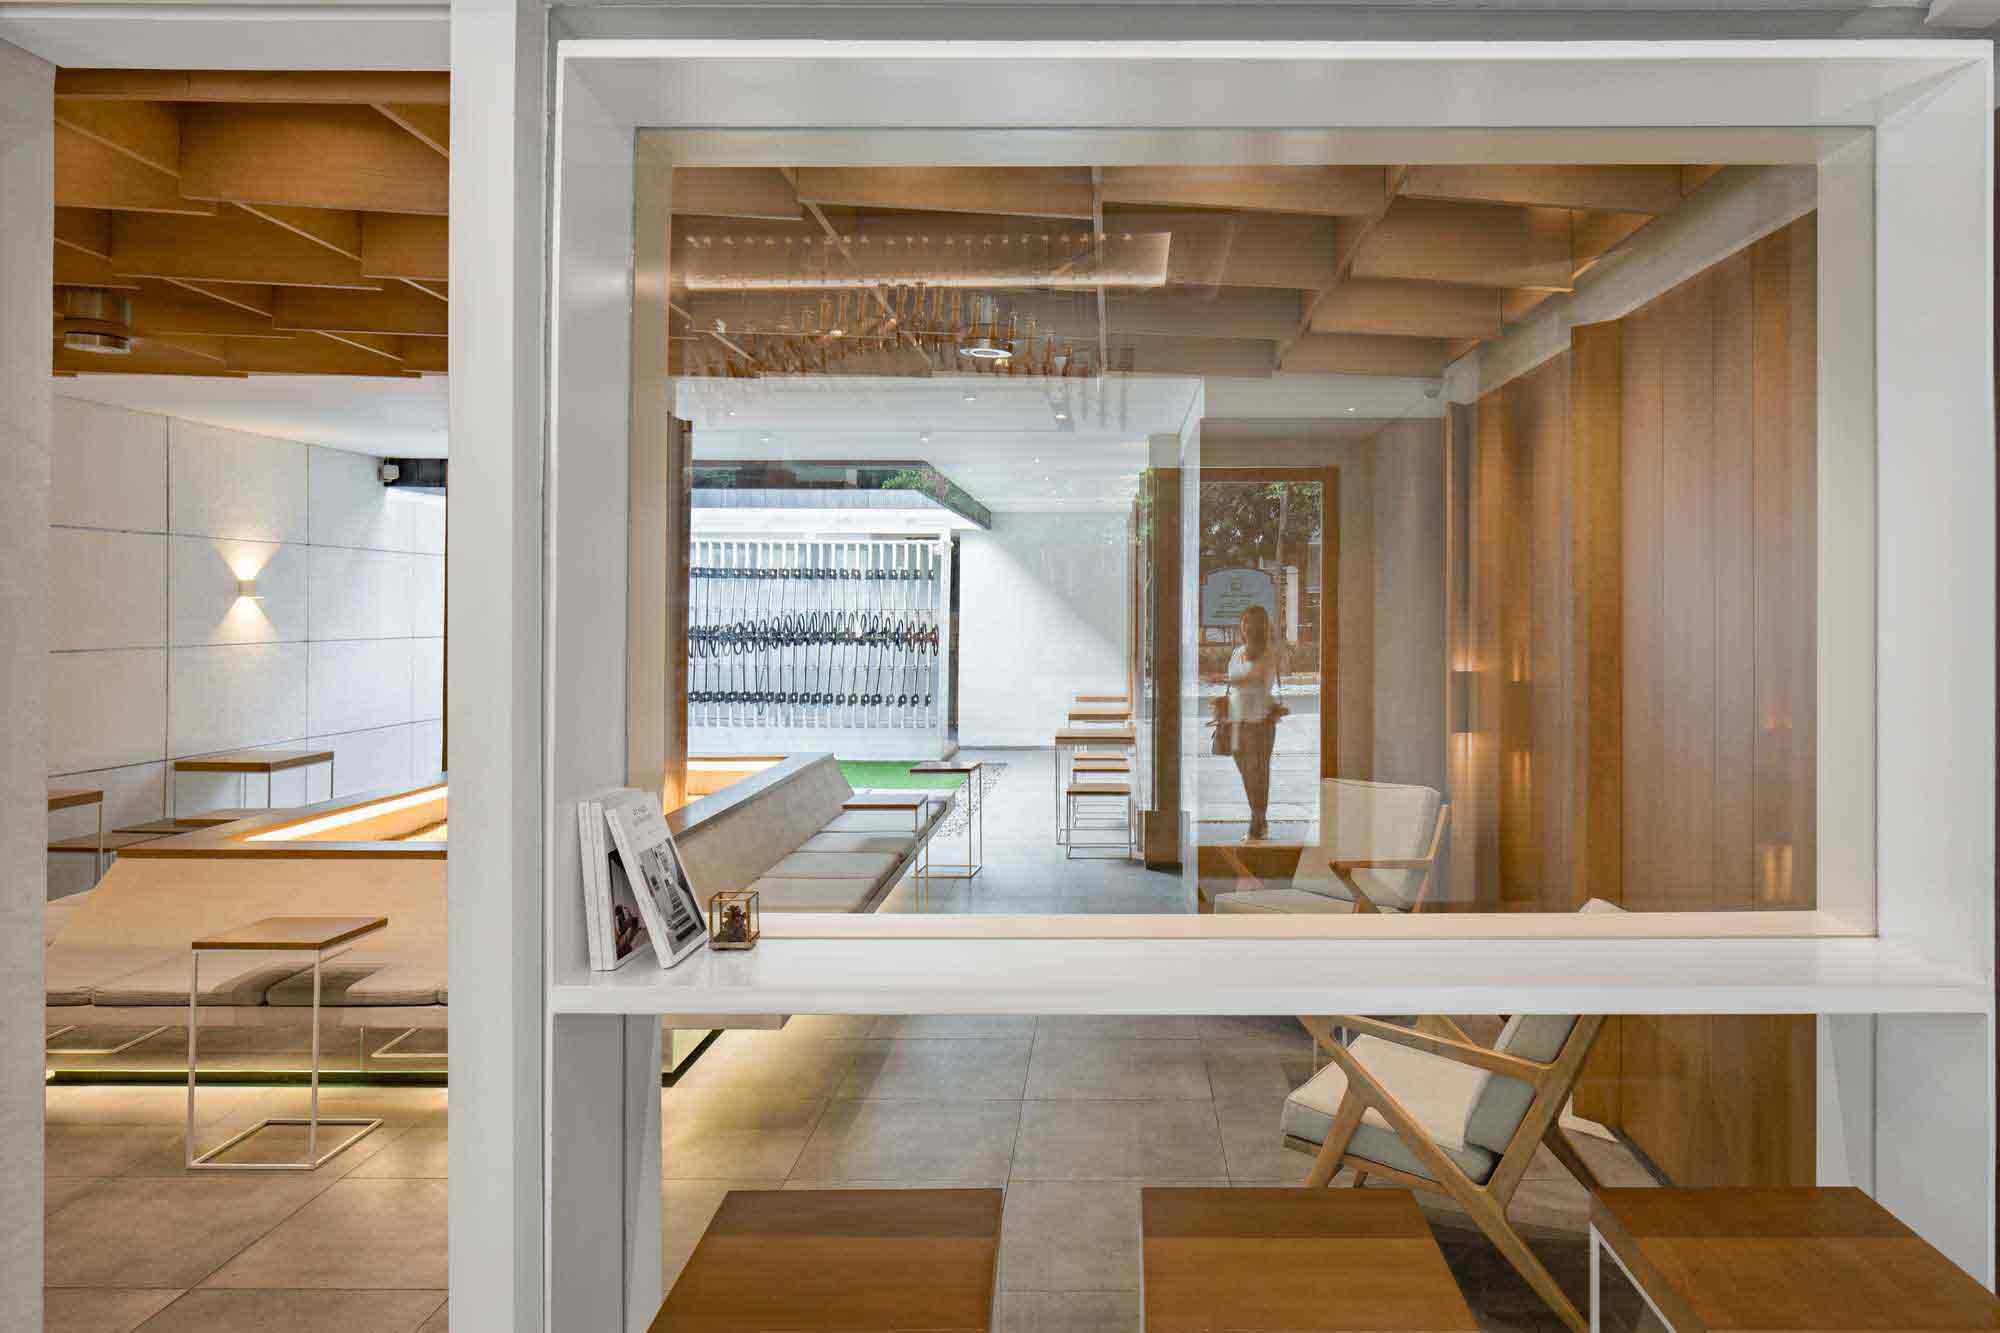 Interior dominasi material kayu, karya PT. Adf, via arsitag.com